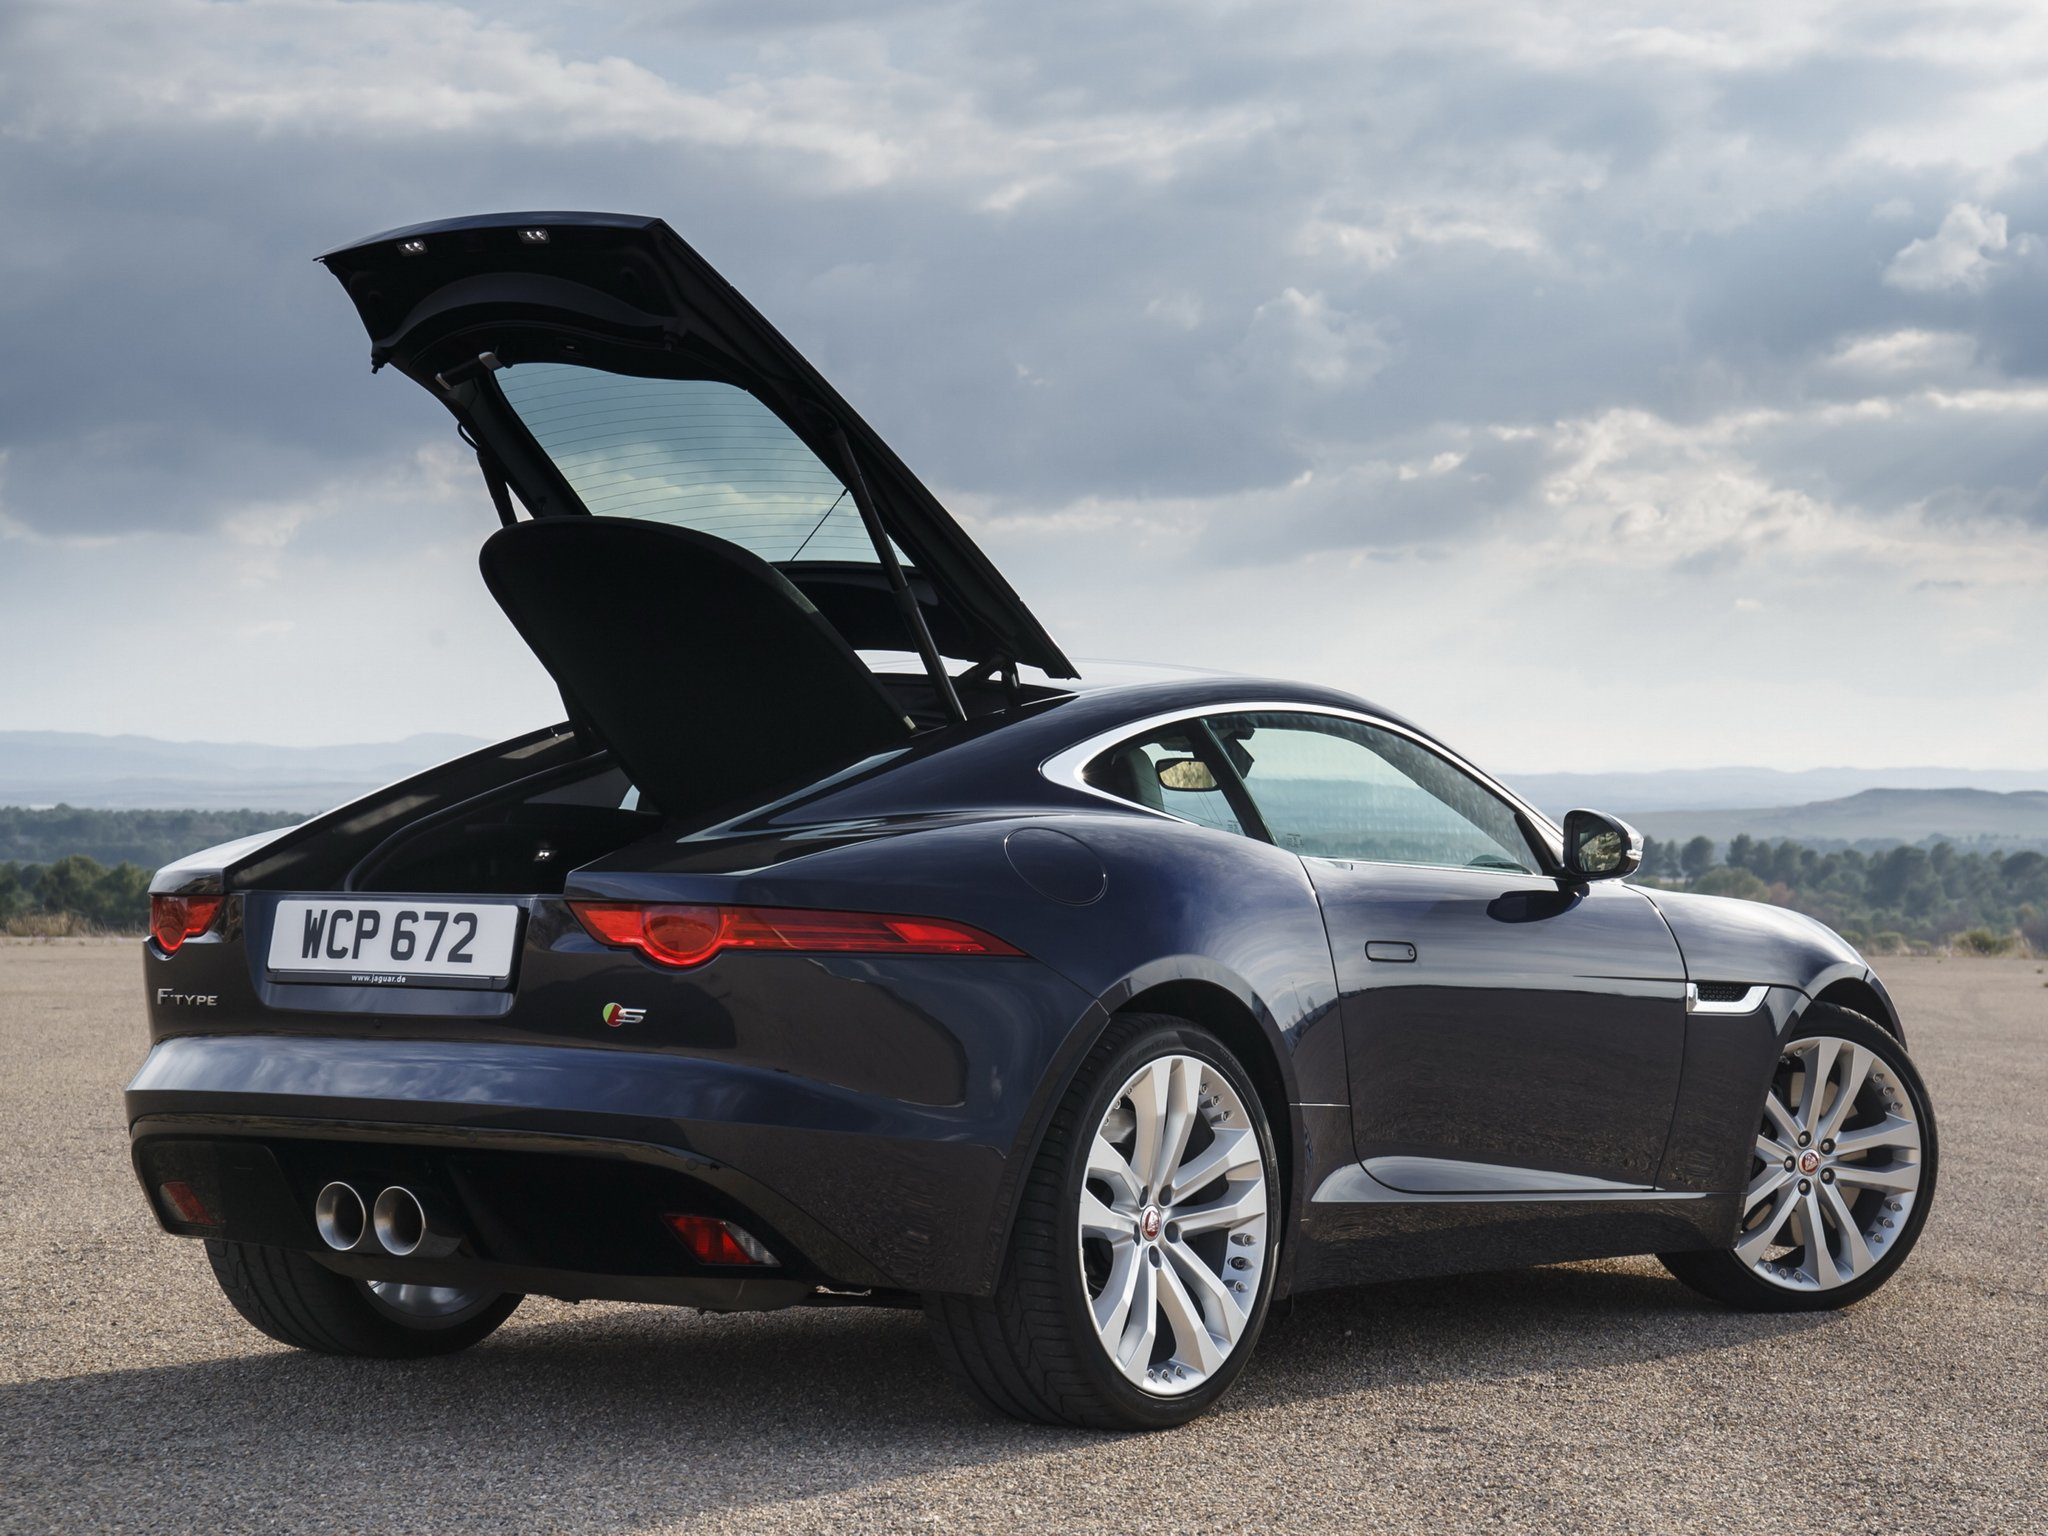 2014 Jaguar F Type S Coupe Ew Wallpaper   2048x1536   331759   WallpaperUP